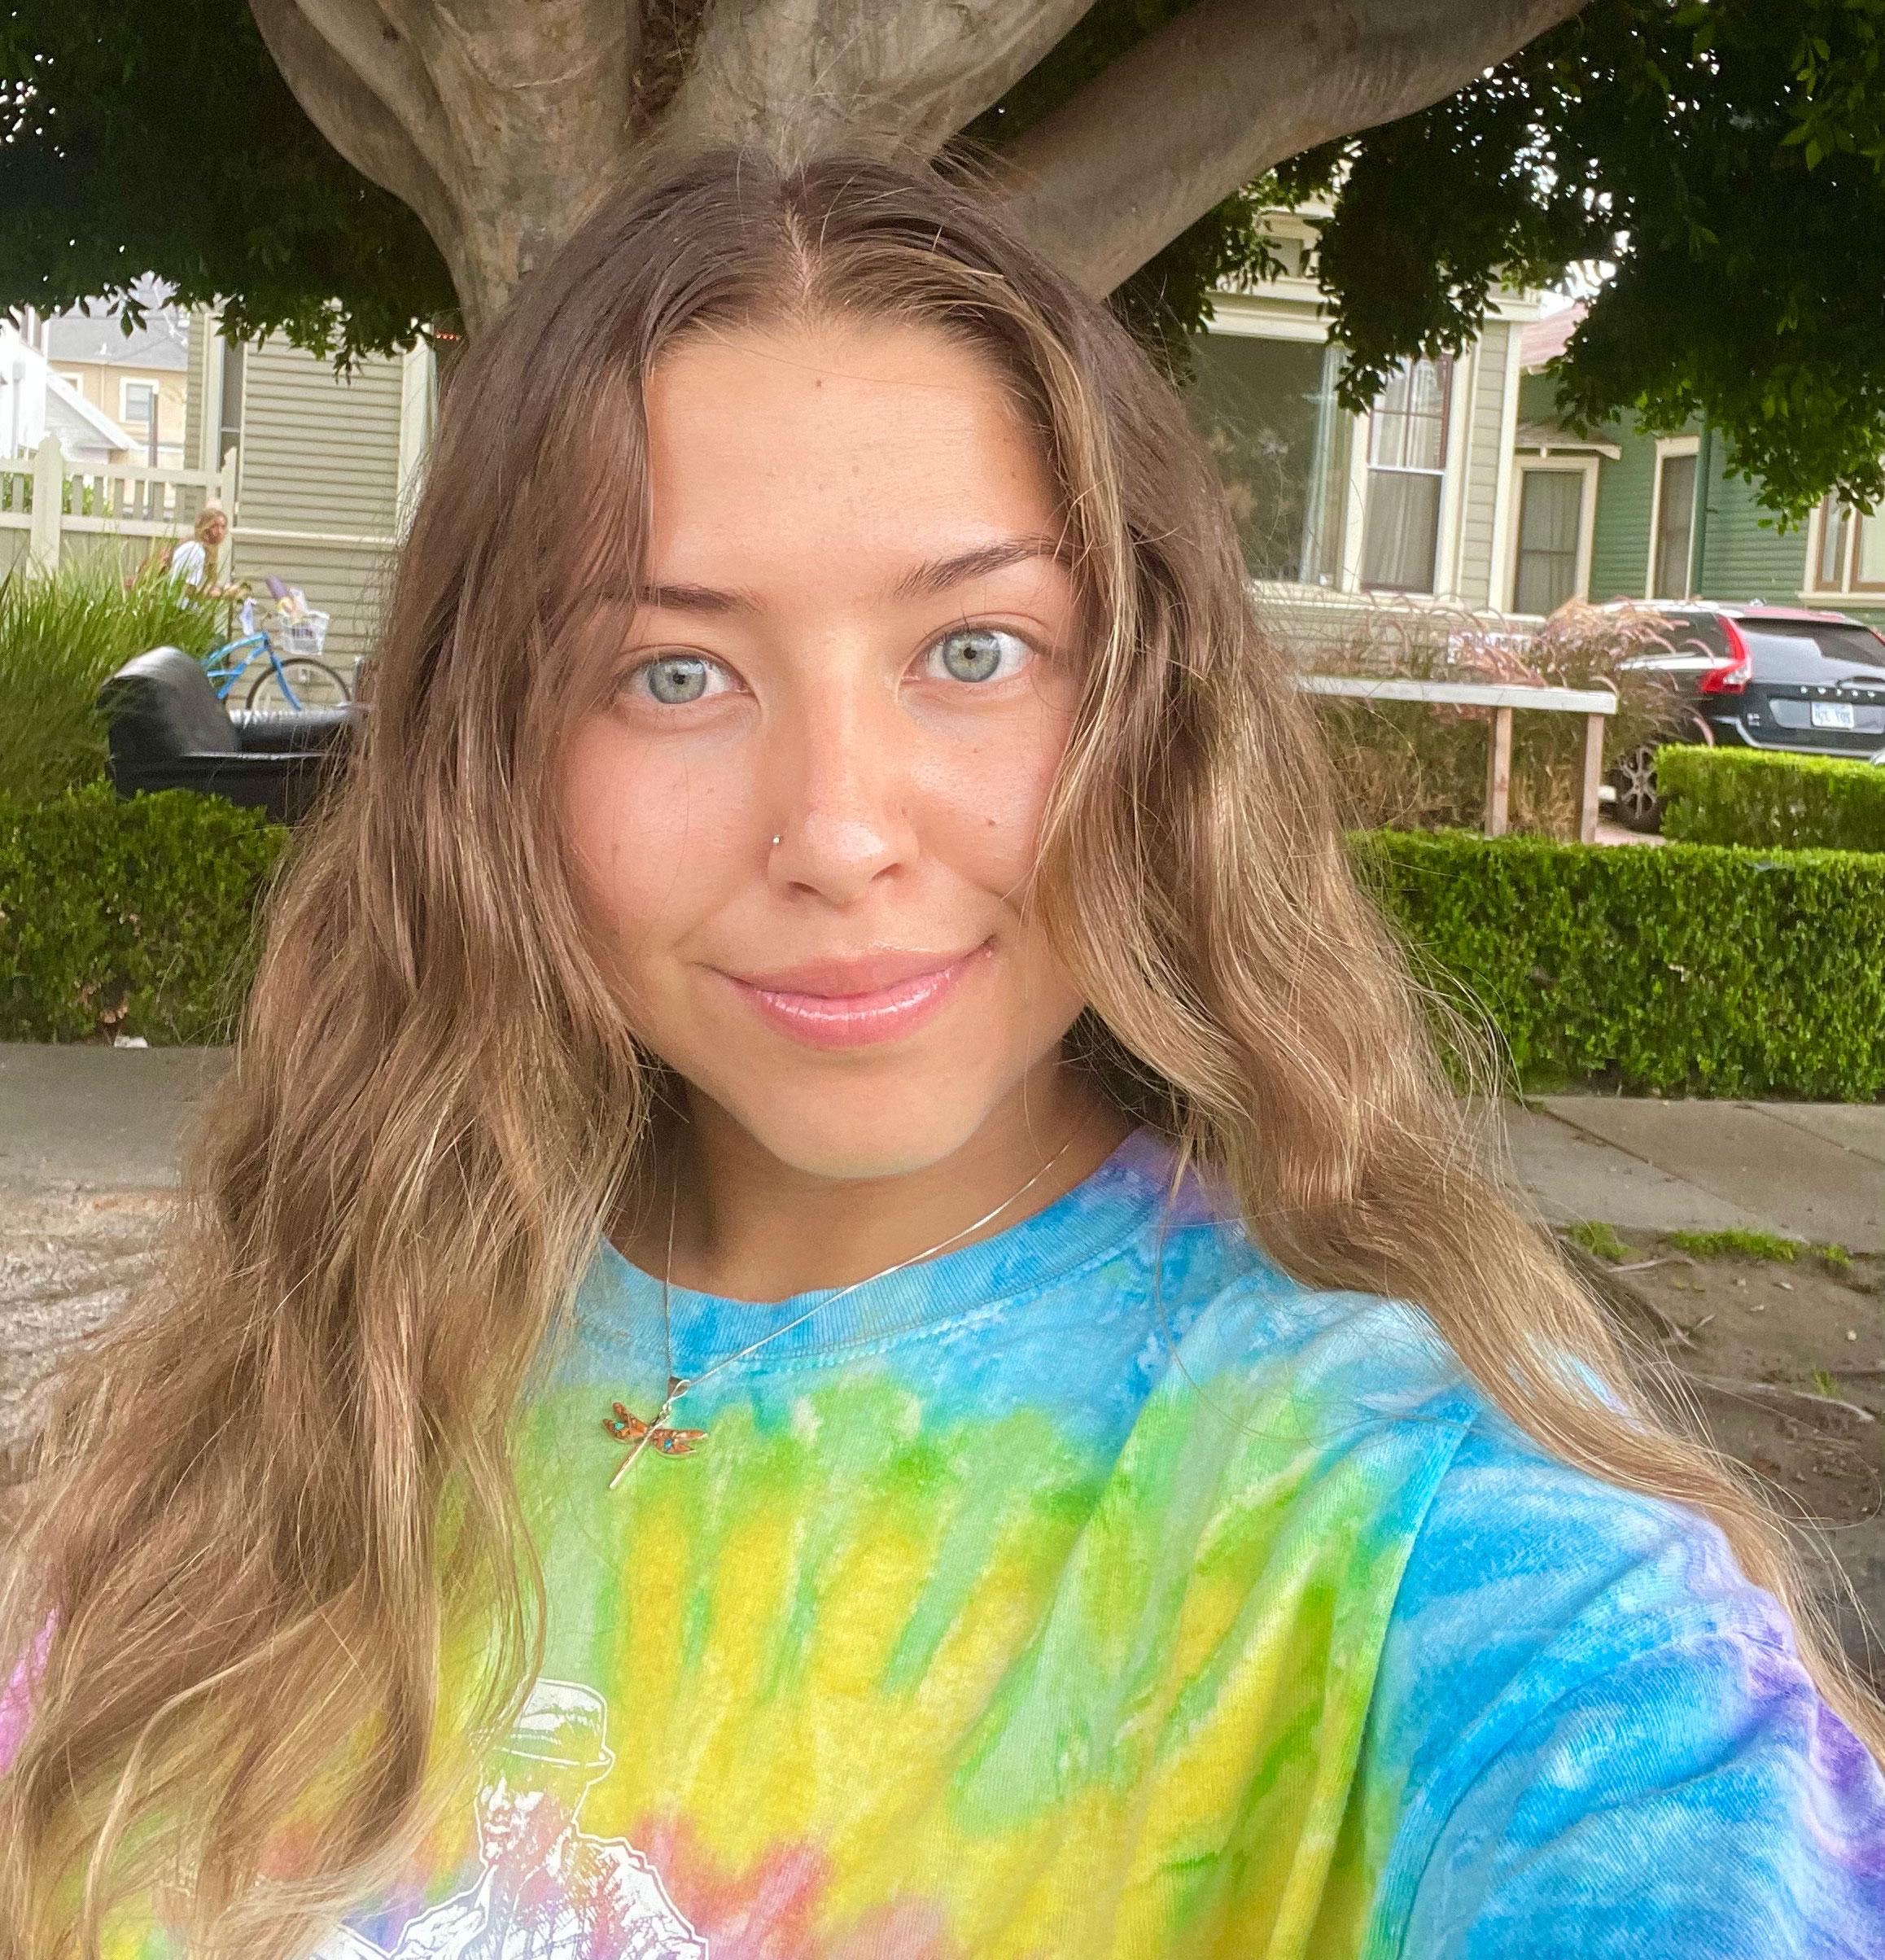 Picture of Cheyenne Chrisp